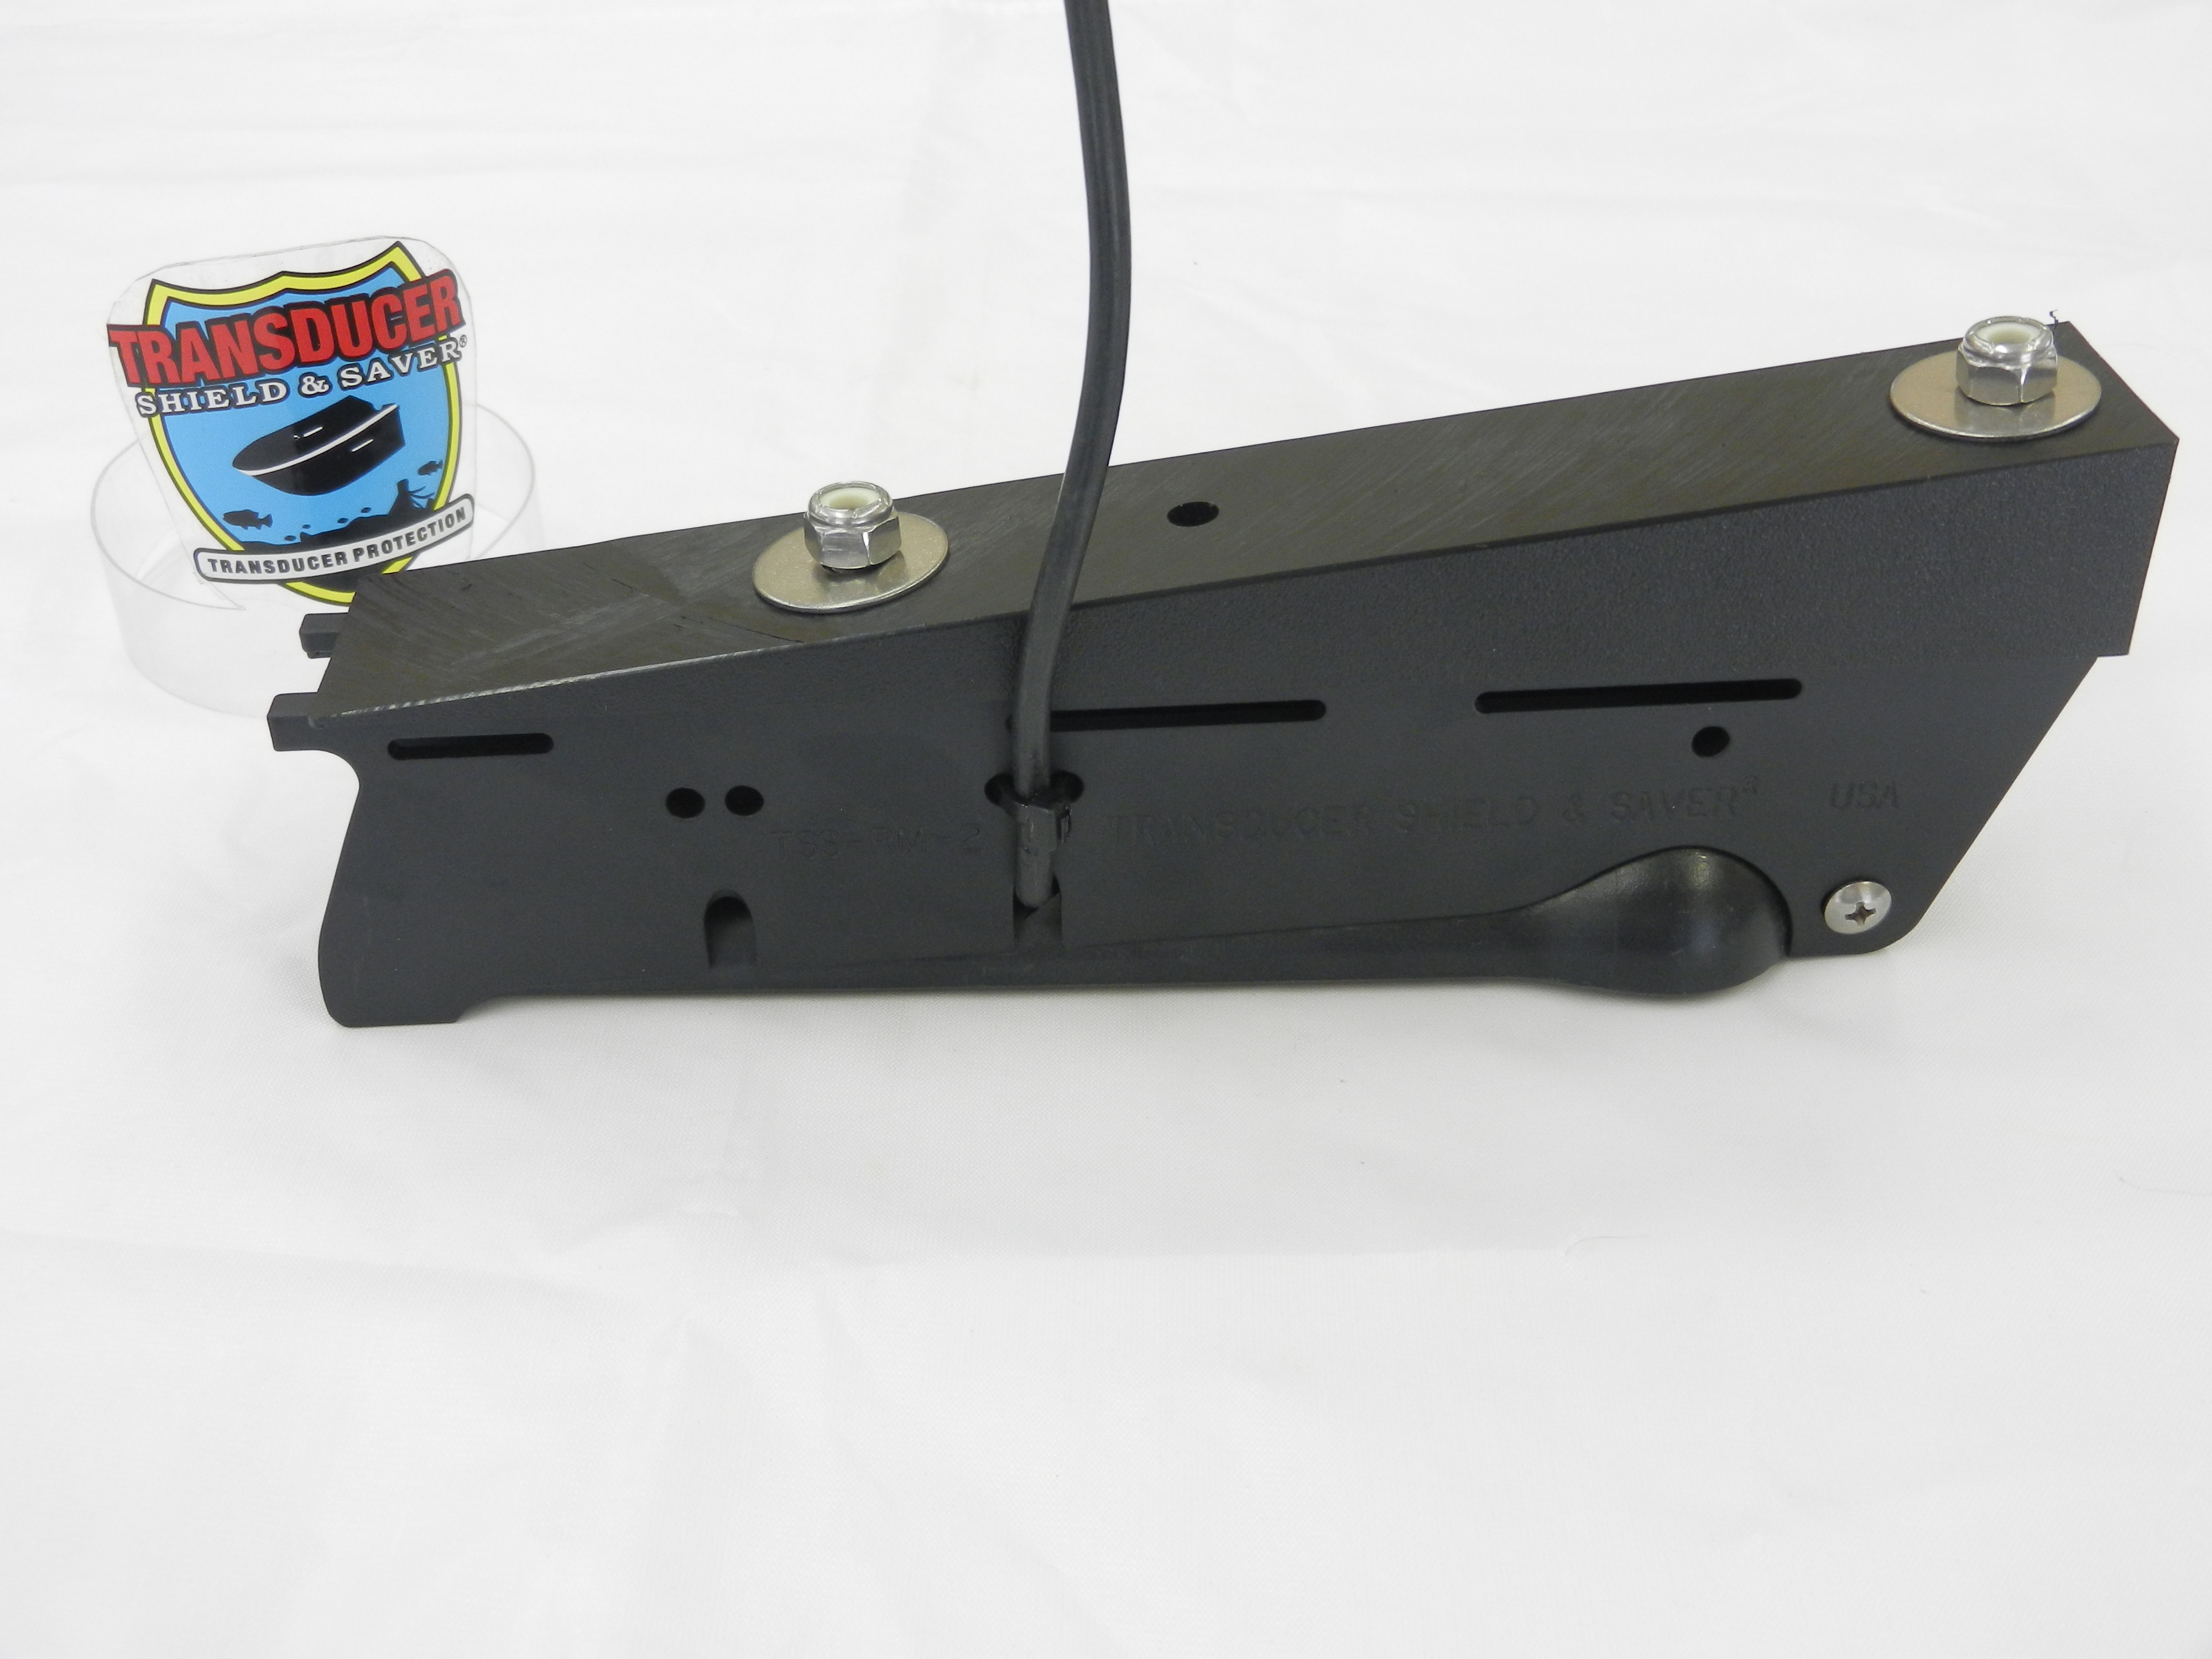 Tm 1-1520-blackhawk